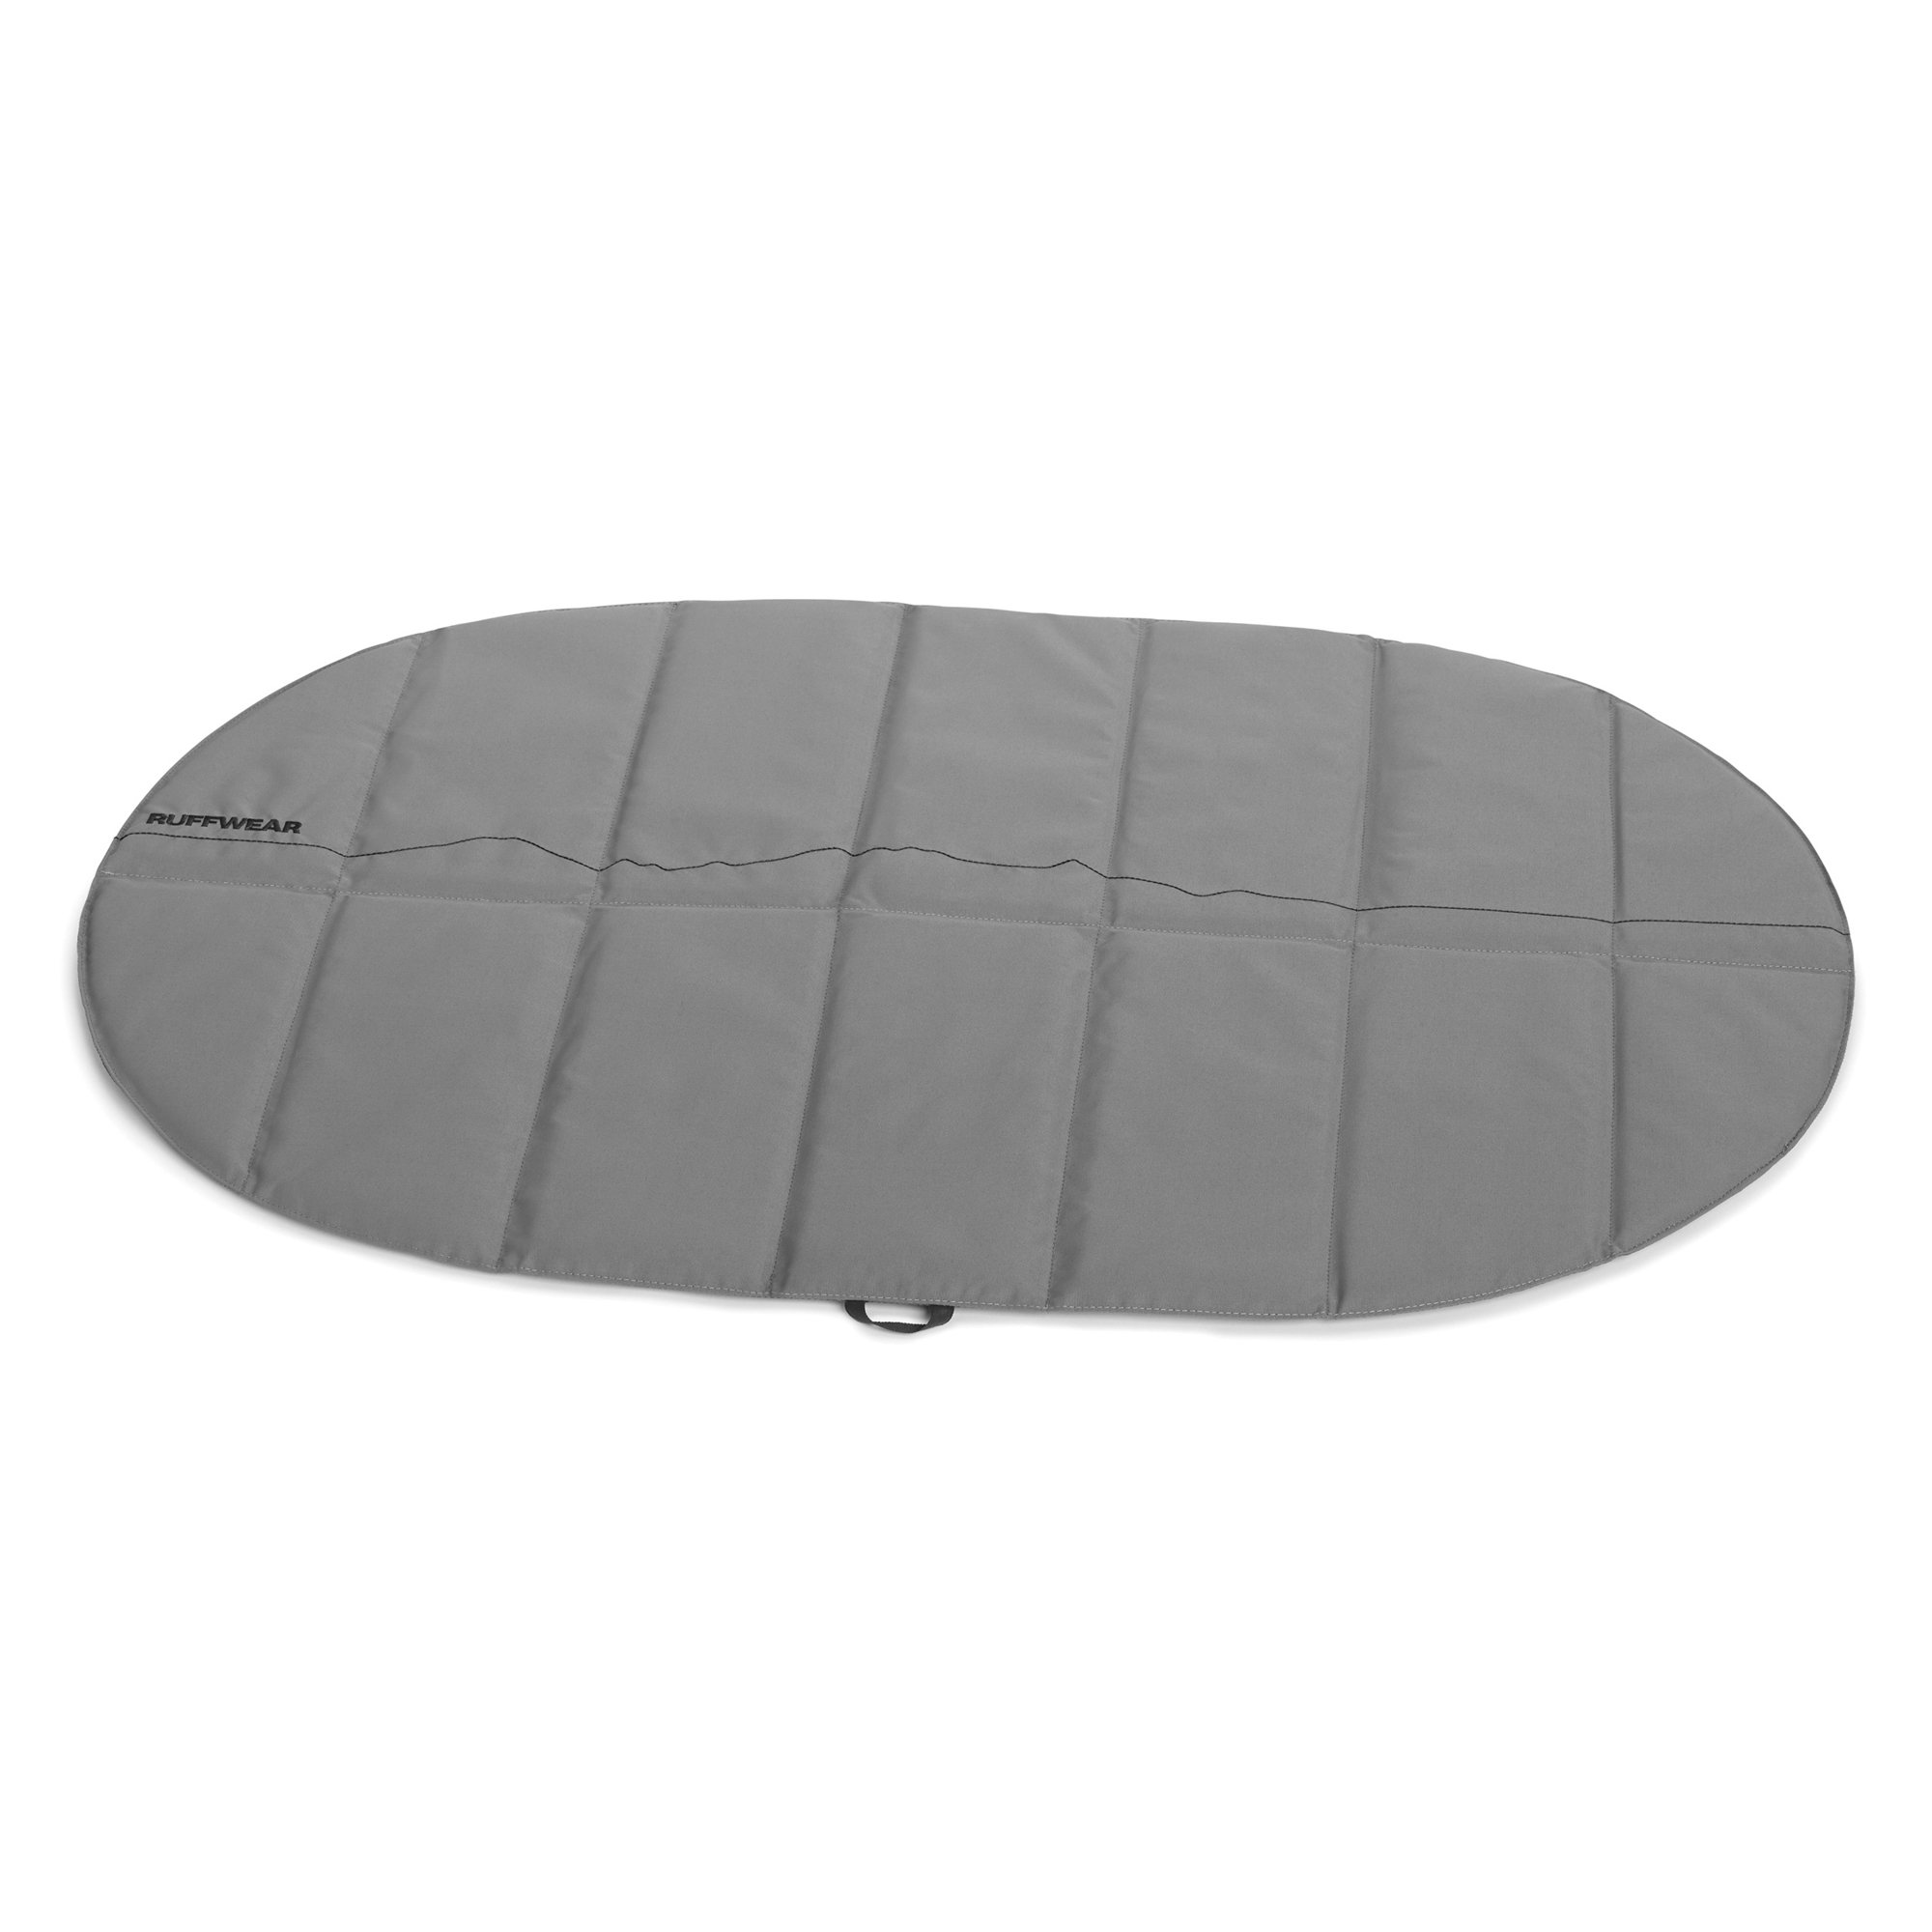 RUFFWEAR - Highlands Pad Portable Bed for Dogs, Granite Gray, Medium